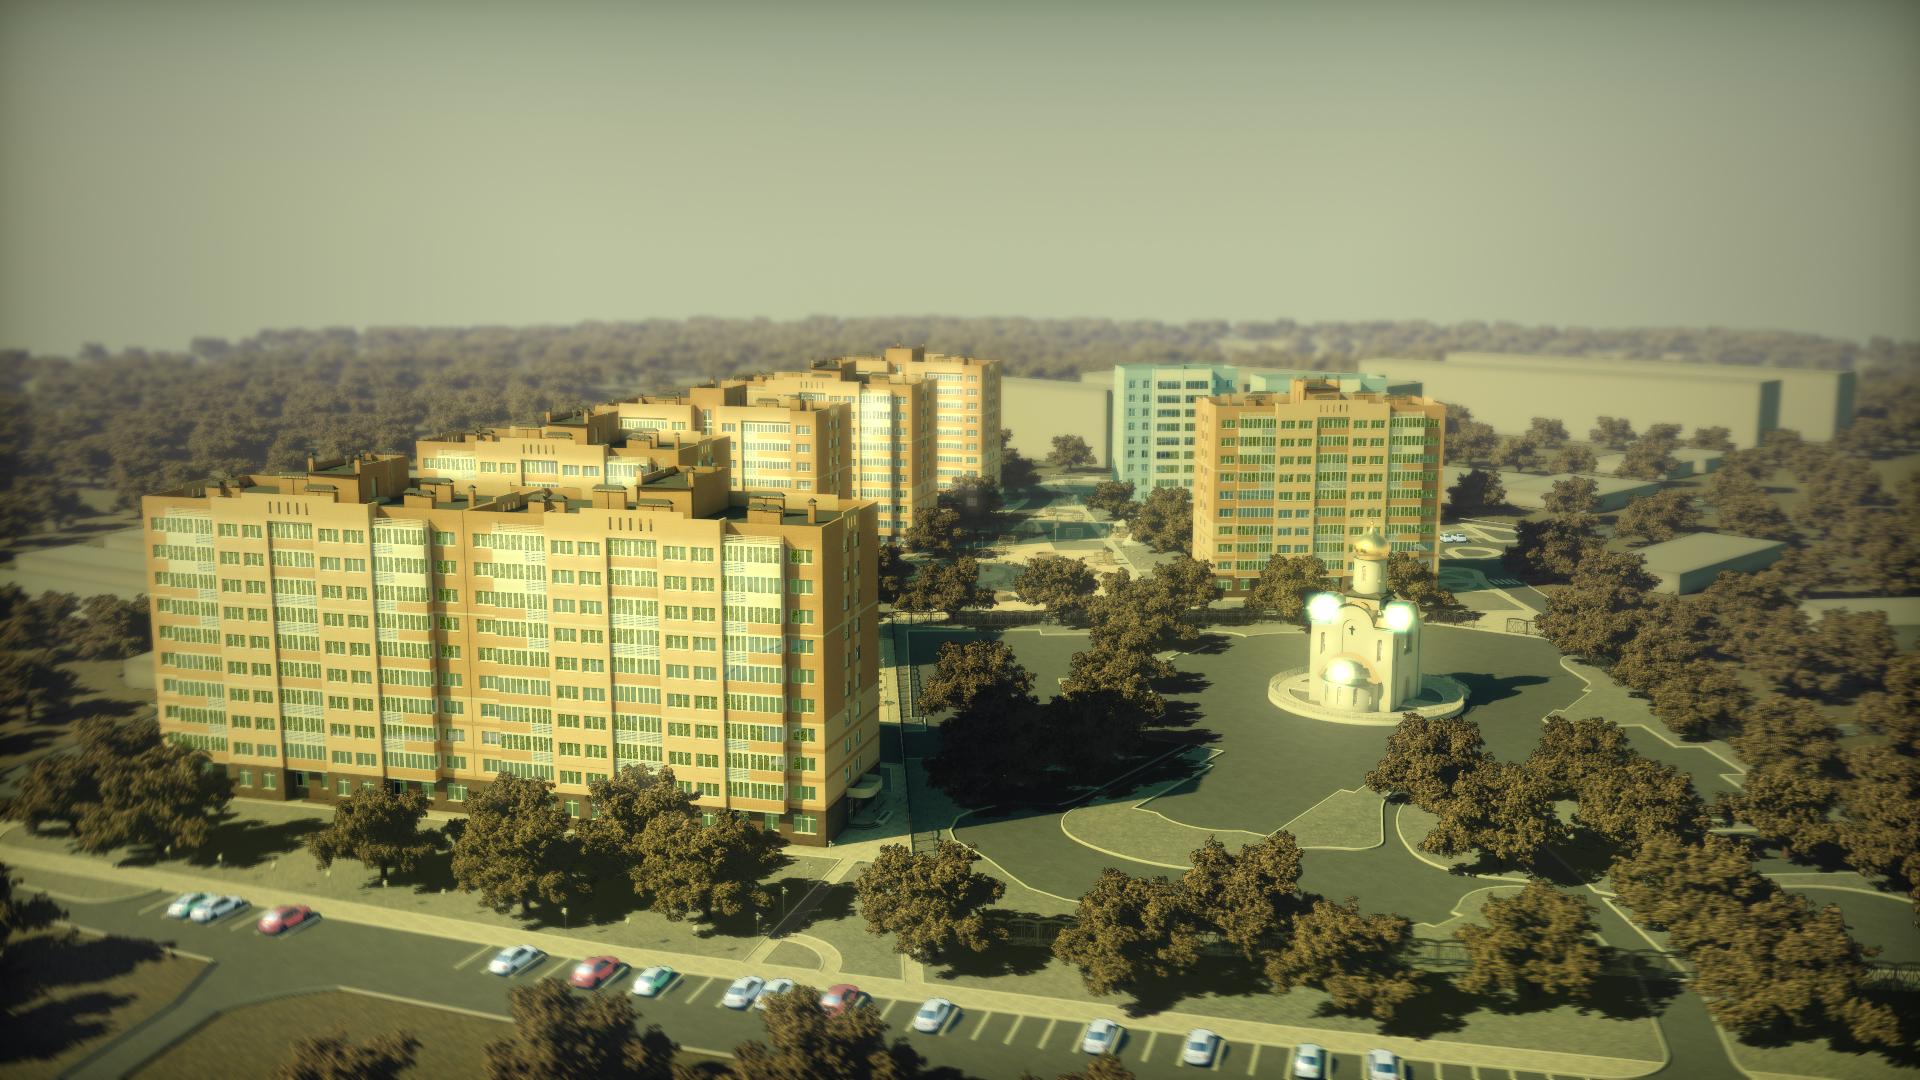 Архитектурная 3д-анимация. Цветокоррекция